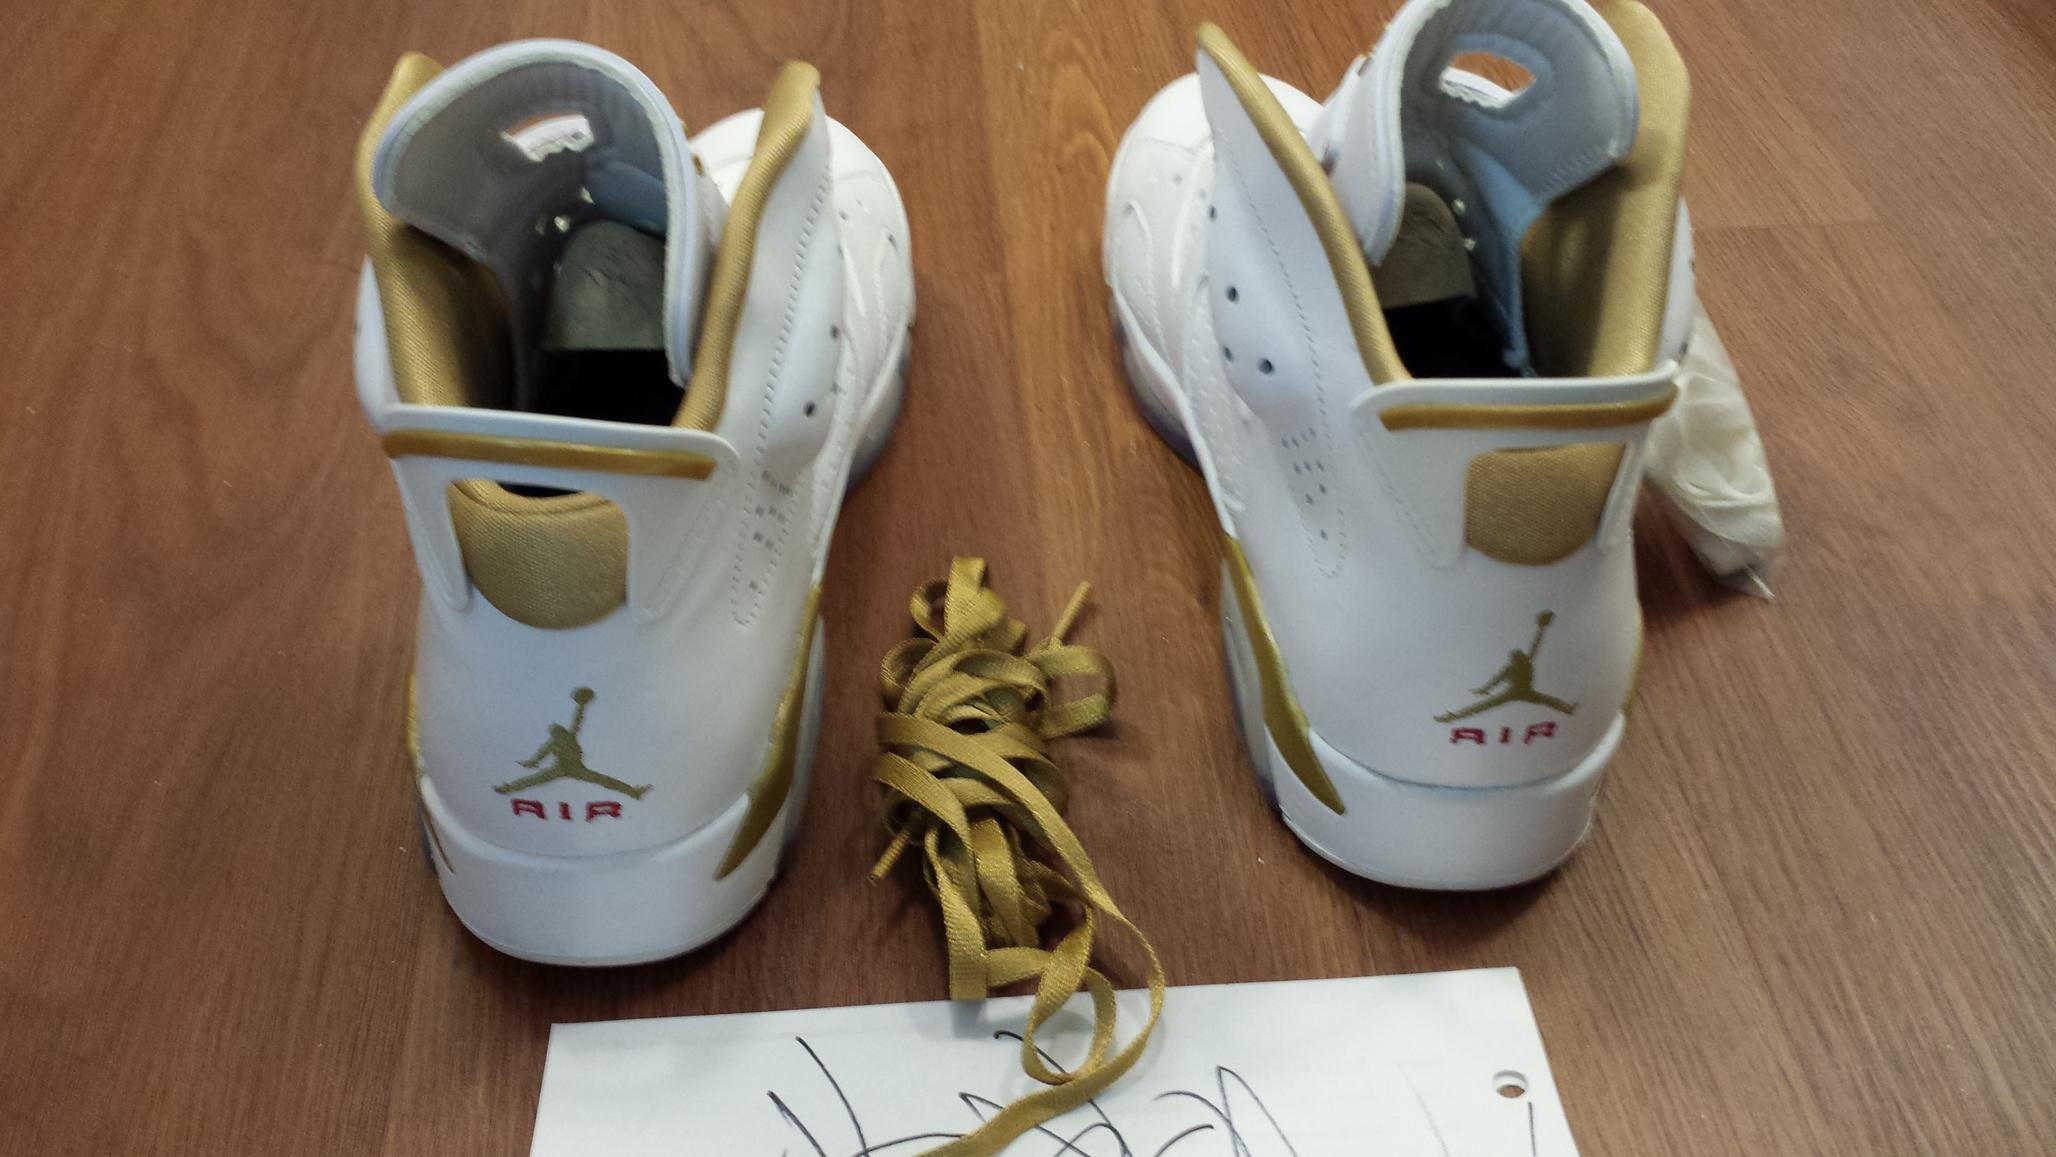 377fc1ba06d ... Nike Air Jordan VI from GMP Pack (size 11) - Thumbnail 3 ...